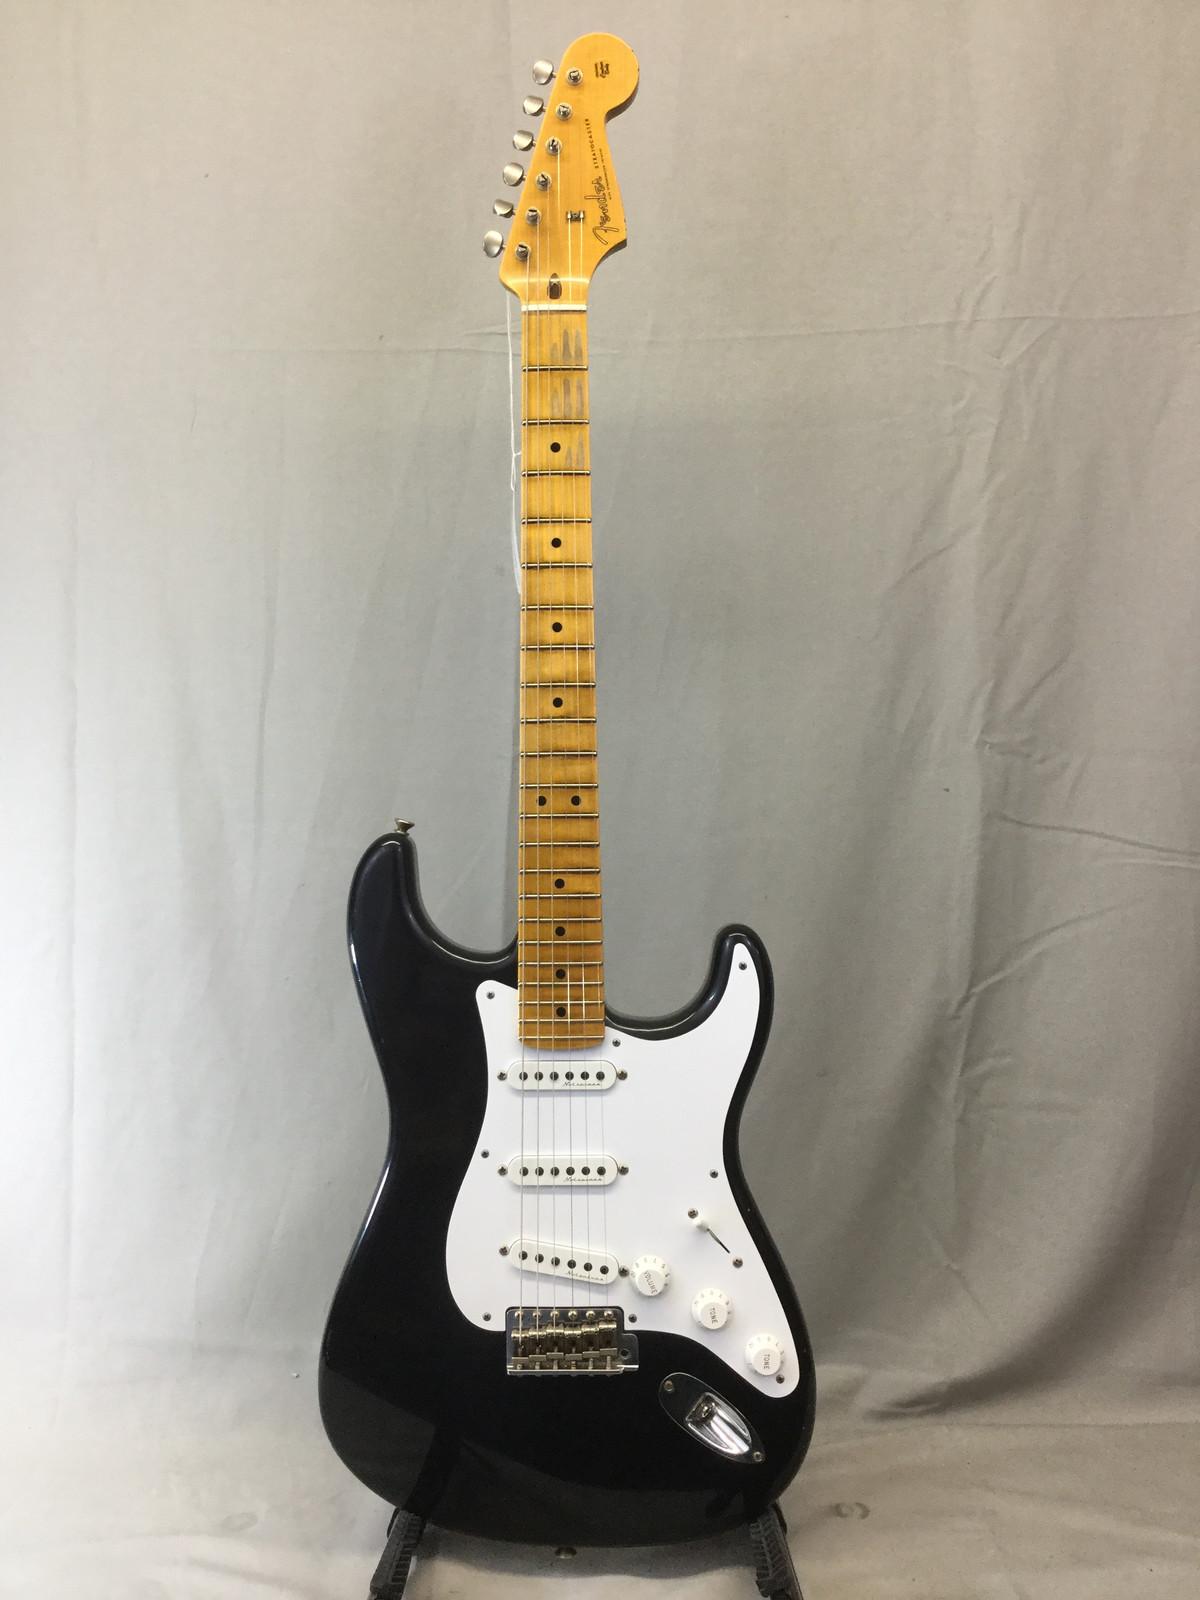 Fender Ltd. Clapton Journeyman Custom Shop Stratocaster - $5100